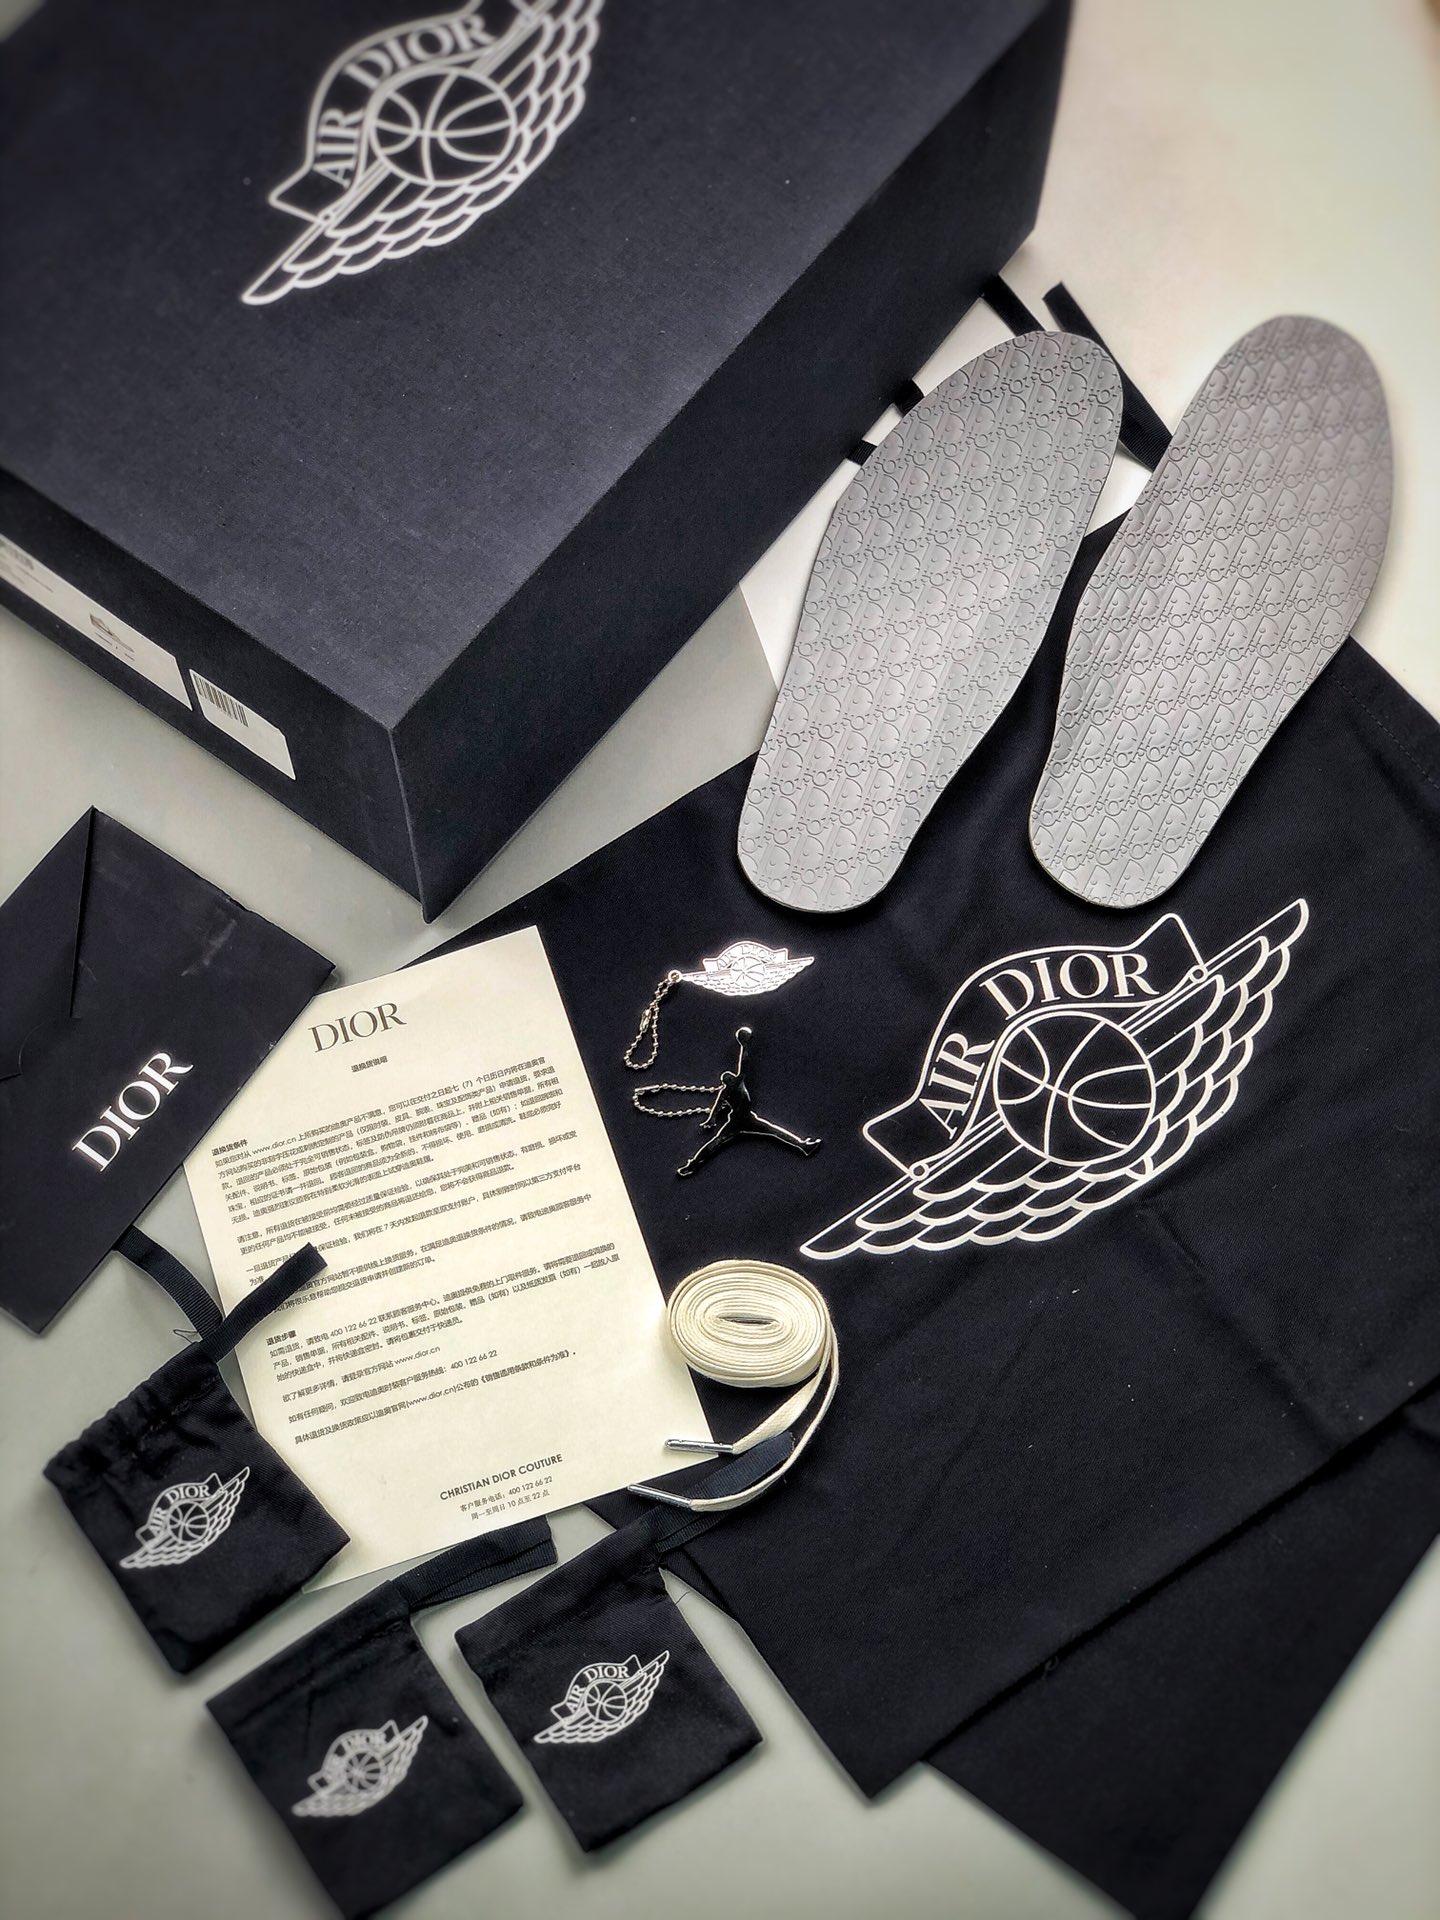 Dior X Air Jordan 1 high OG 白灰_s2纯原AJ12